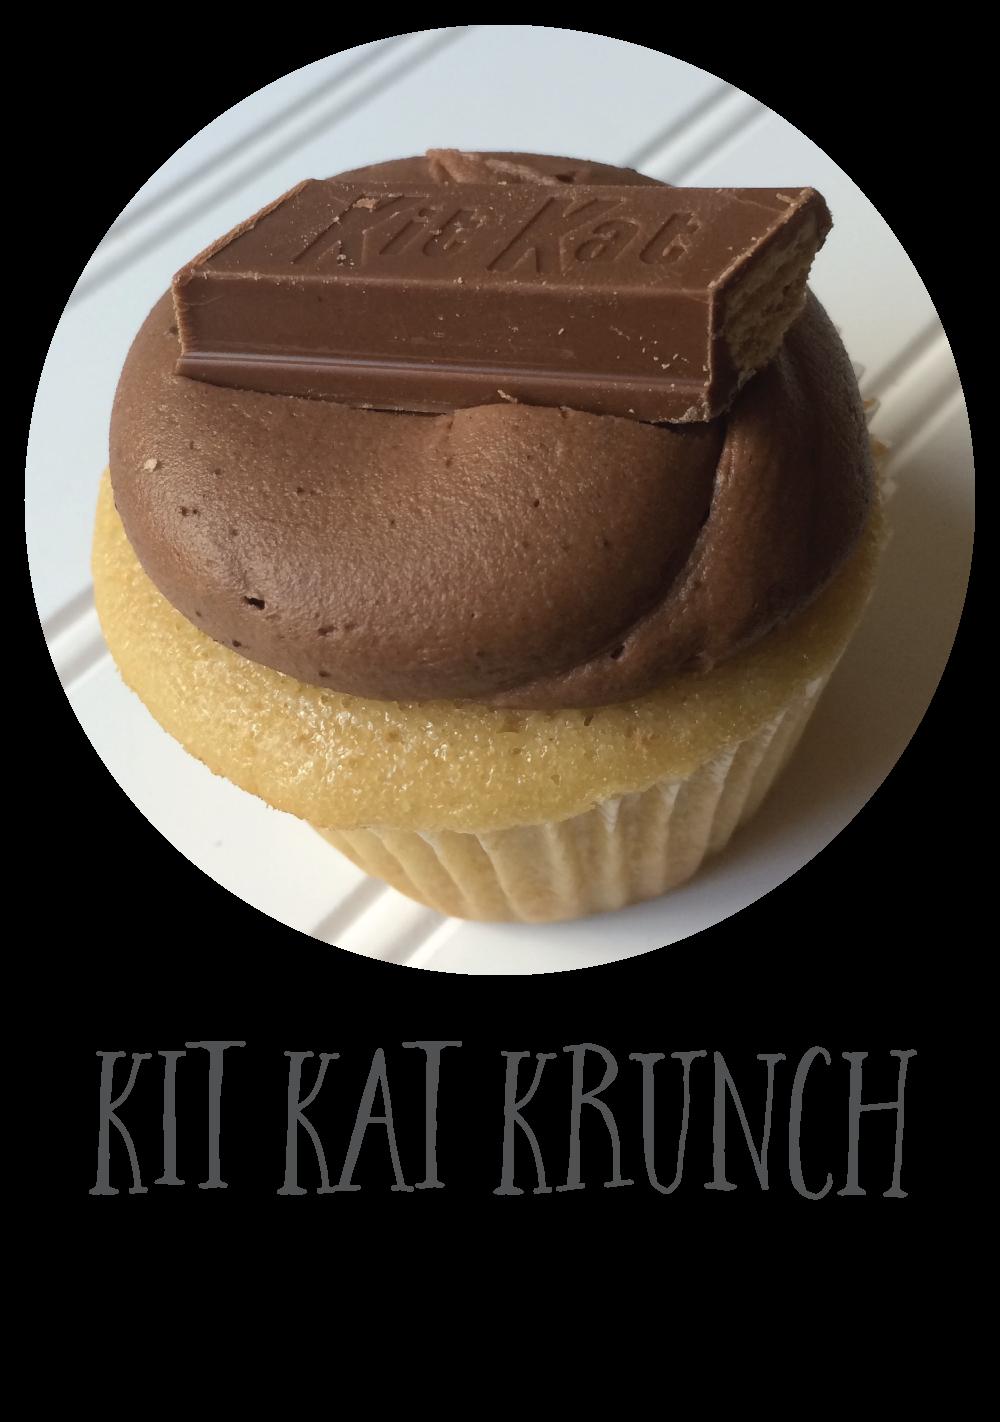 Kit-Kat-Krunch.png